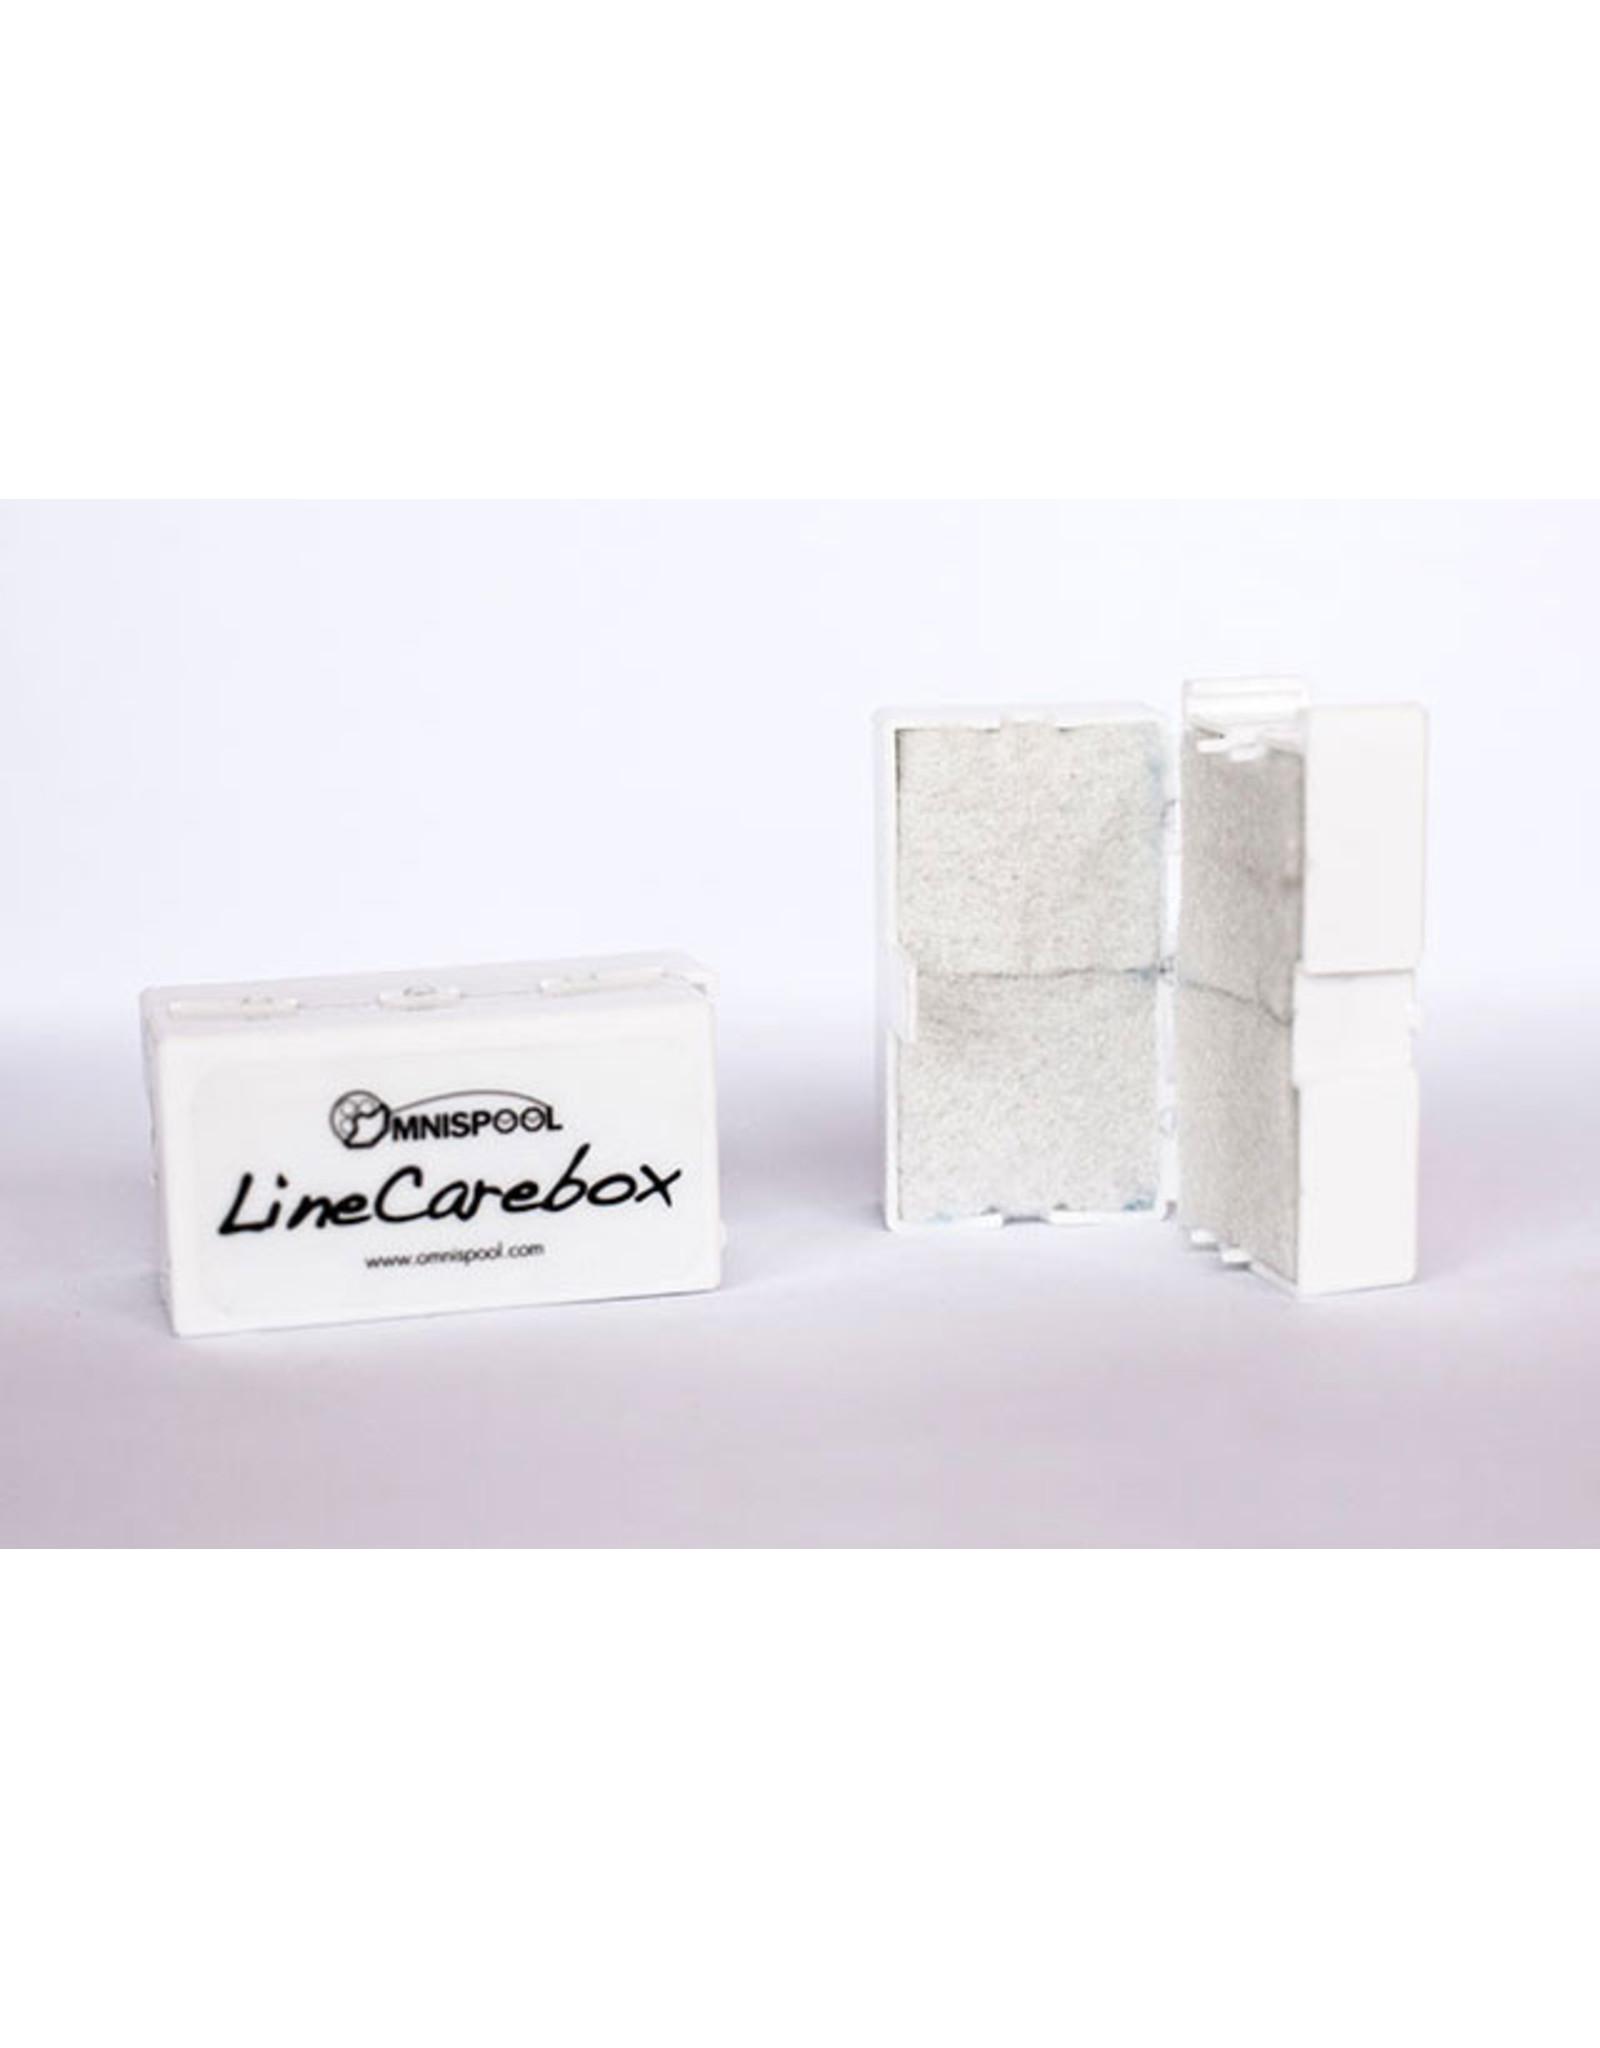 OMNISPOOL Linecarebox By Omnispool